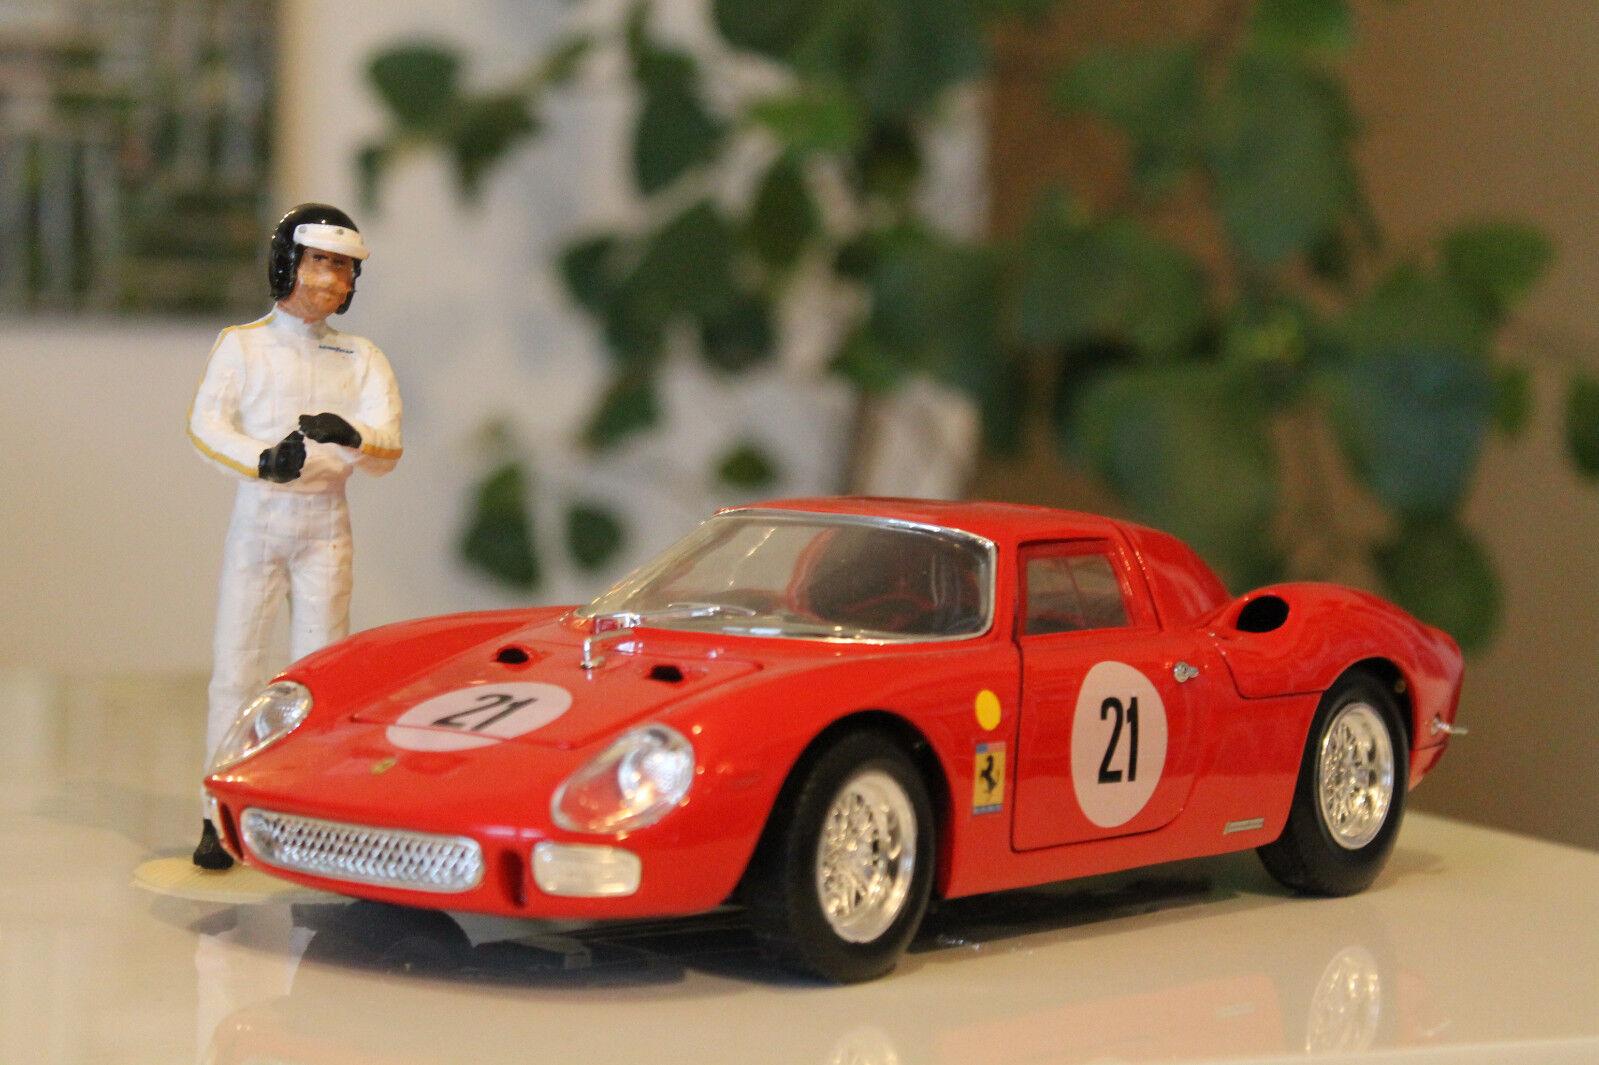 Le Mans Siegermodel 1965 Jochen Rindt Masten Gregory Ferrari 250LM 1 18 F1